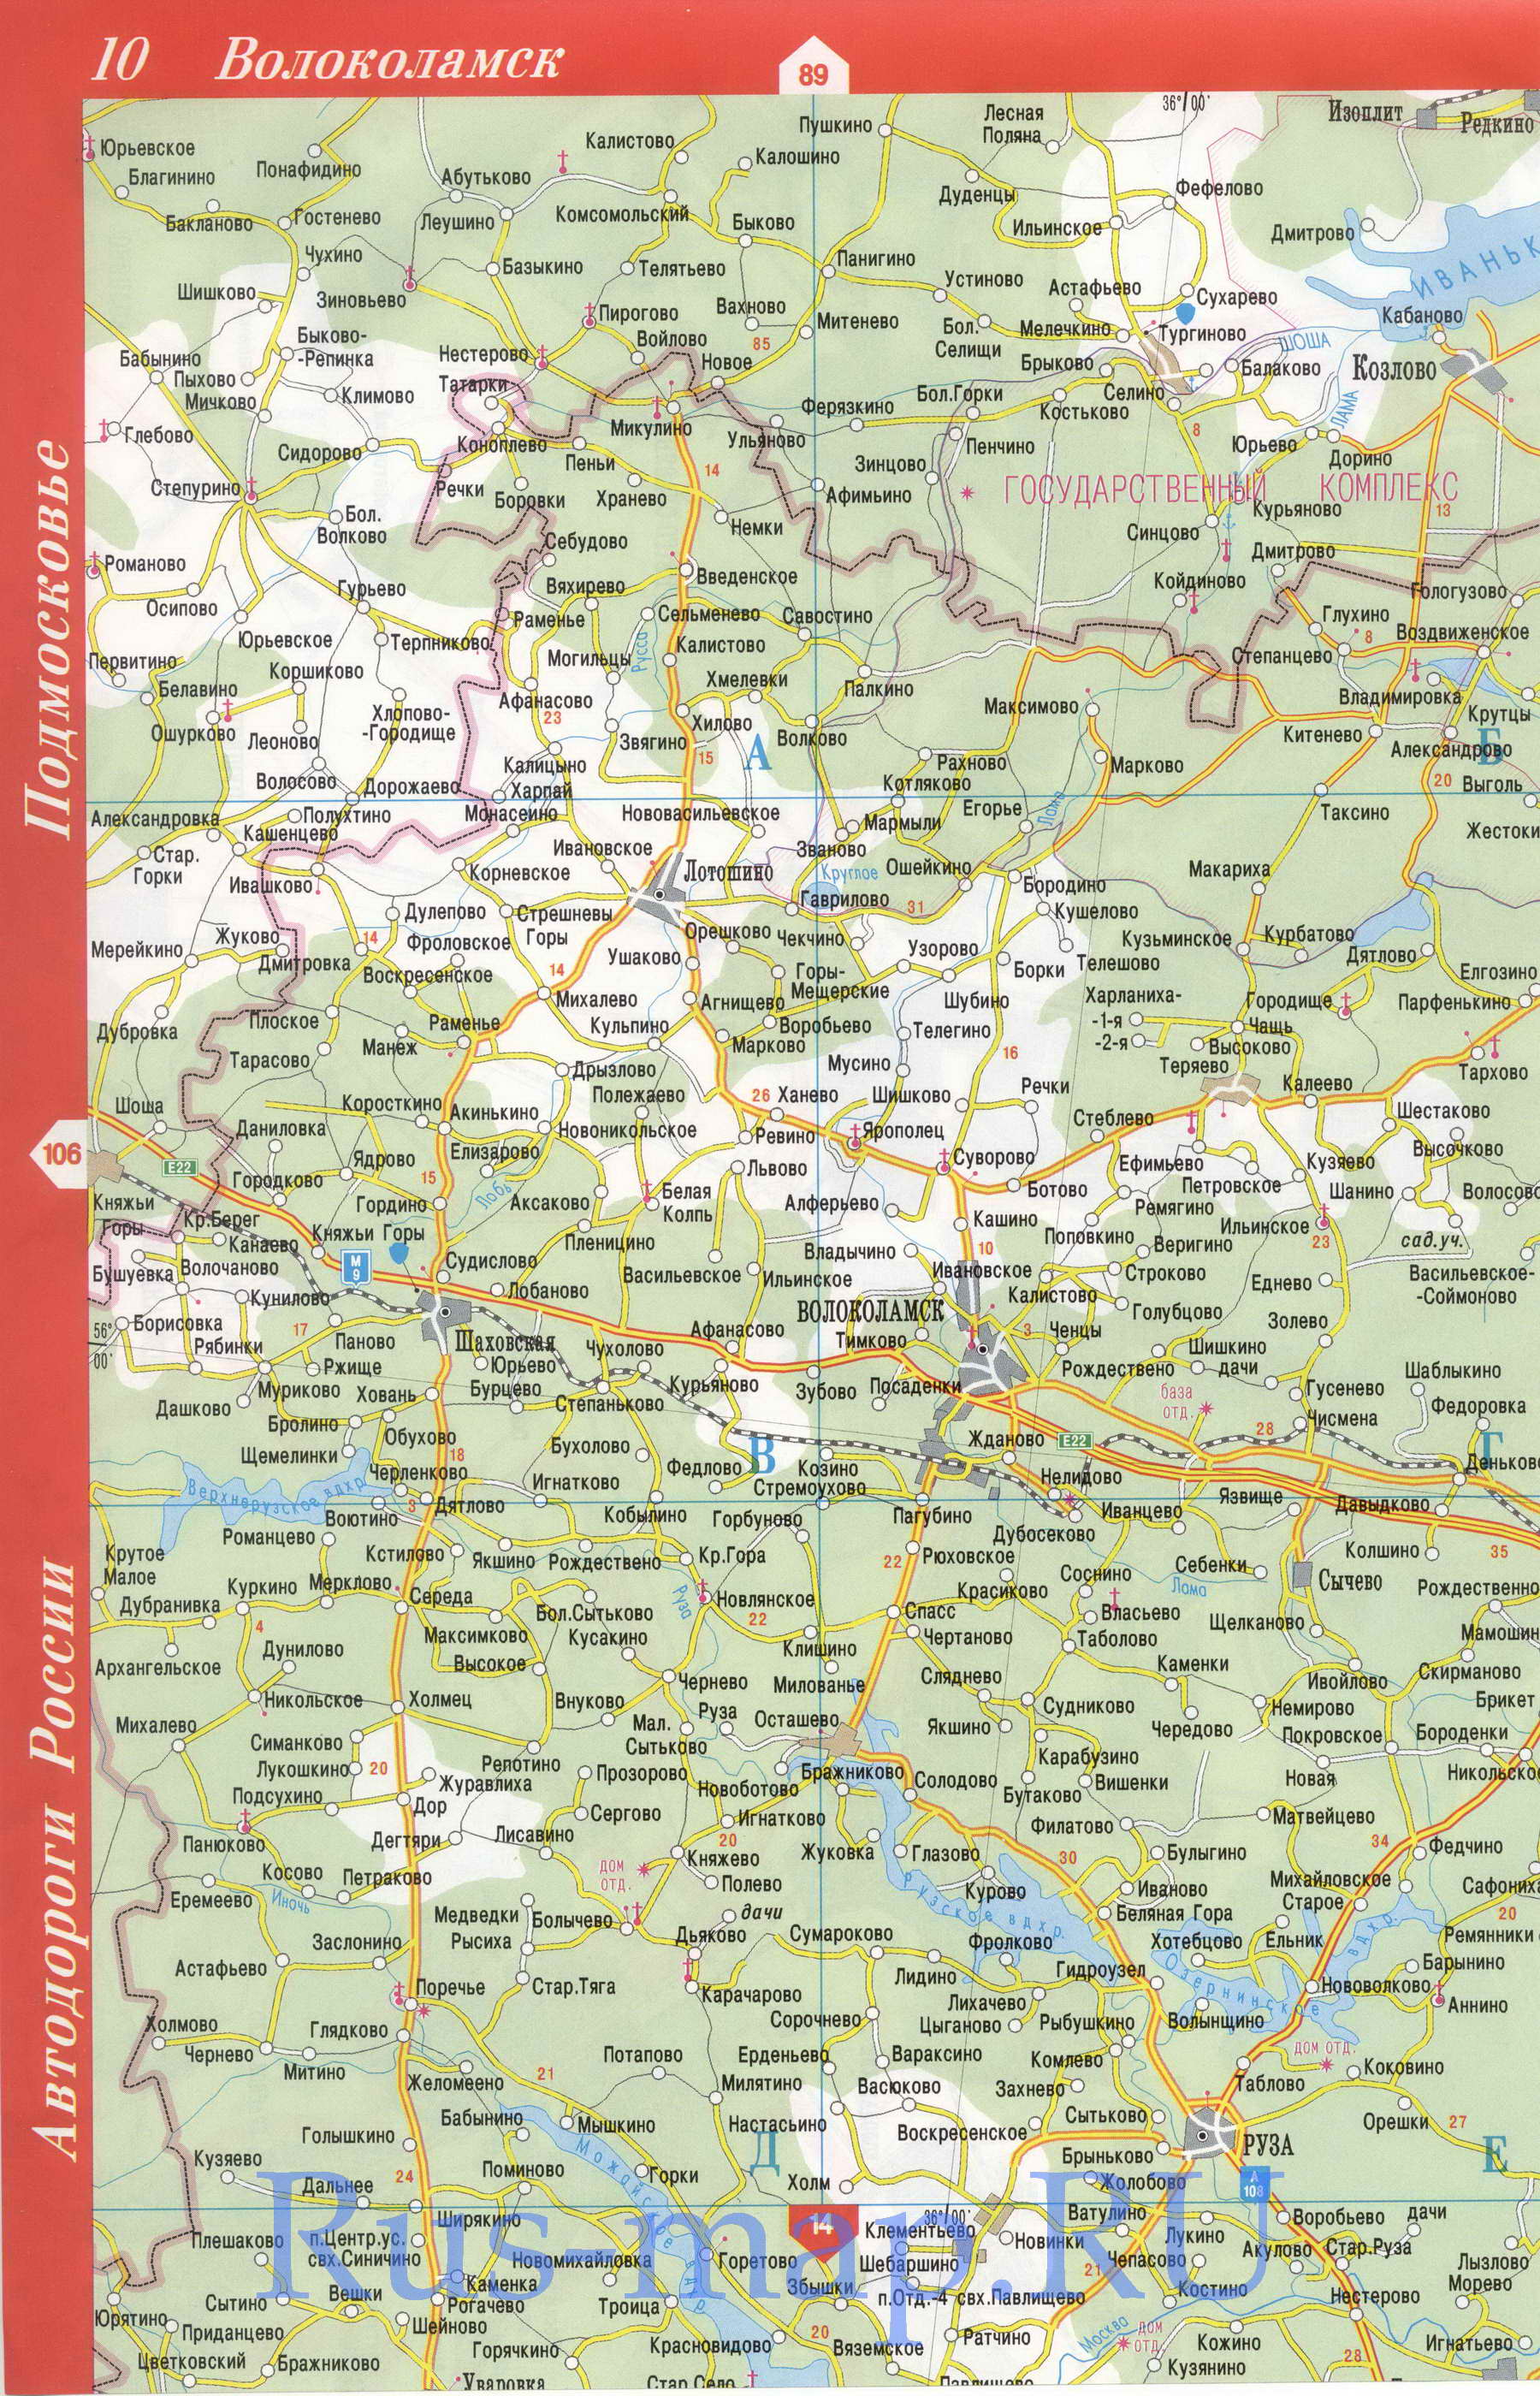 Карта Королёва подробная: районы, названия улиц